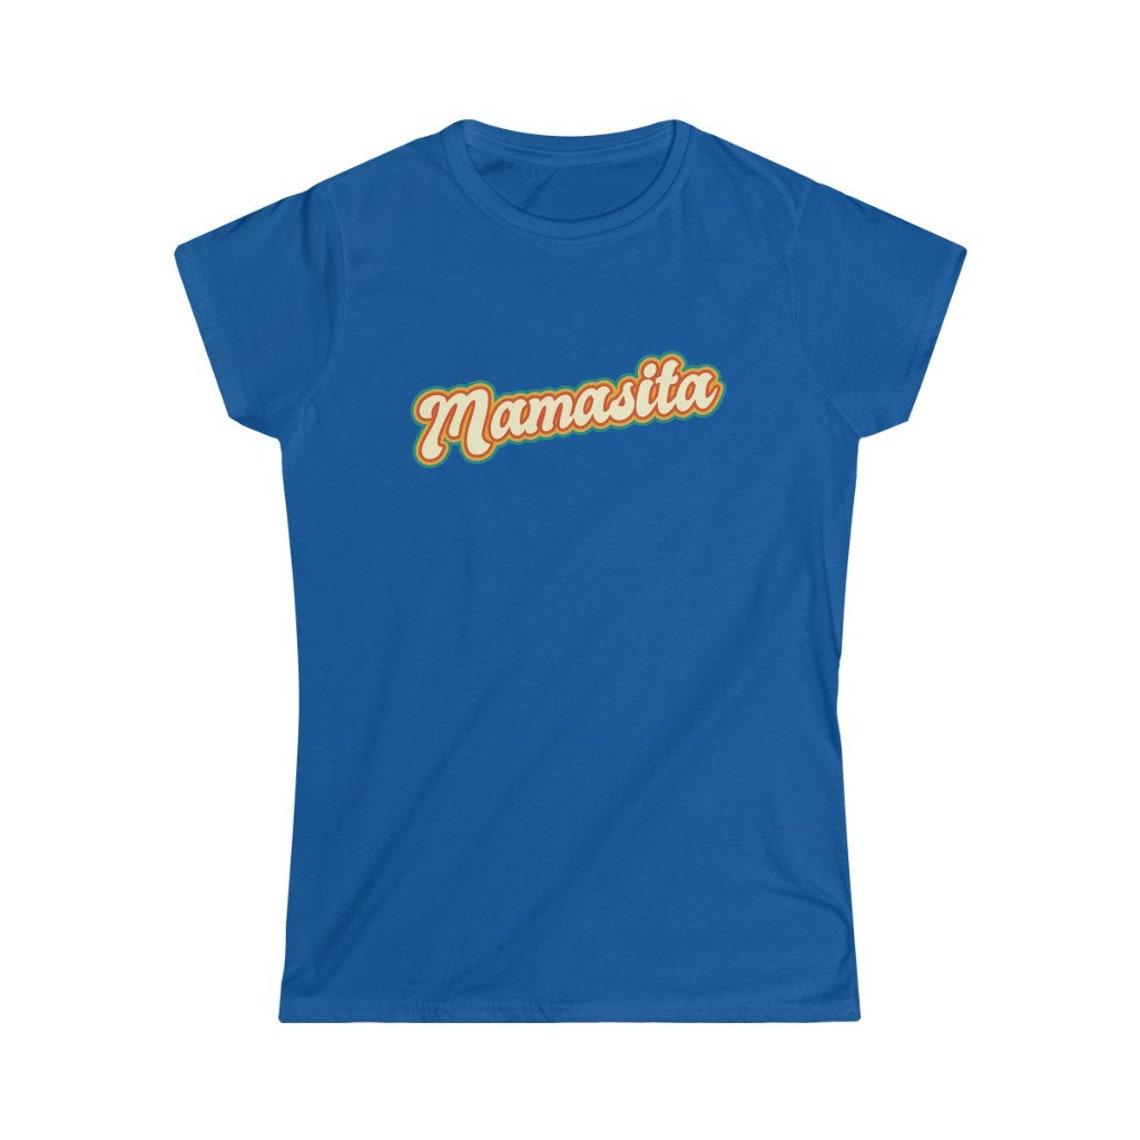 Mamasita Damen Softstyle T-Shirt heiße Latina T-shirt   Etsy